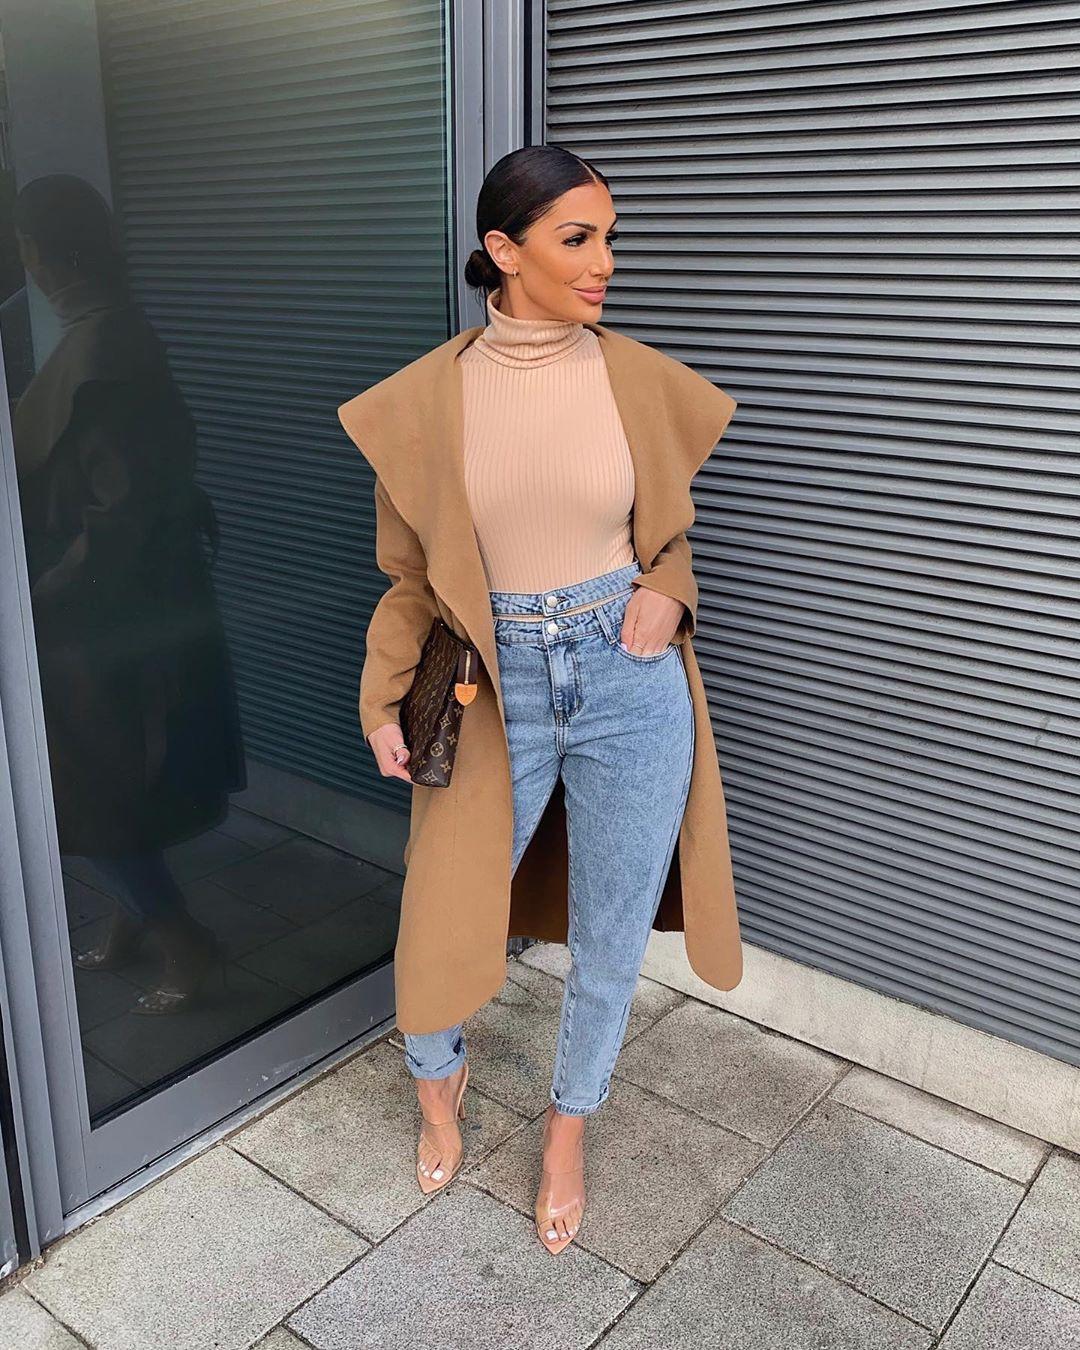 Katerina Themis ? crop top, denim, jeans outfit pinterest